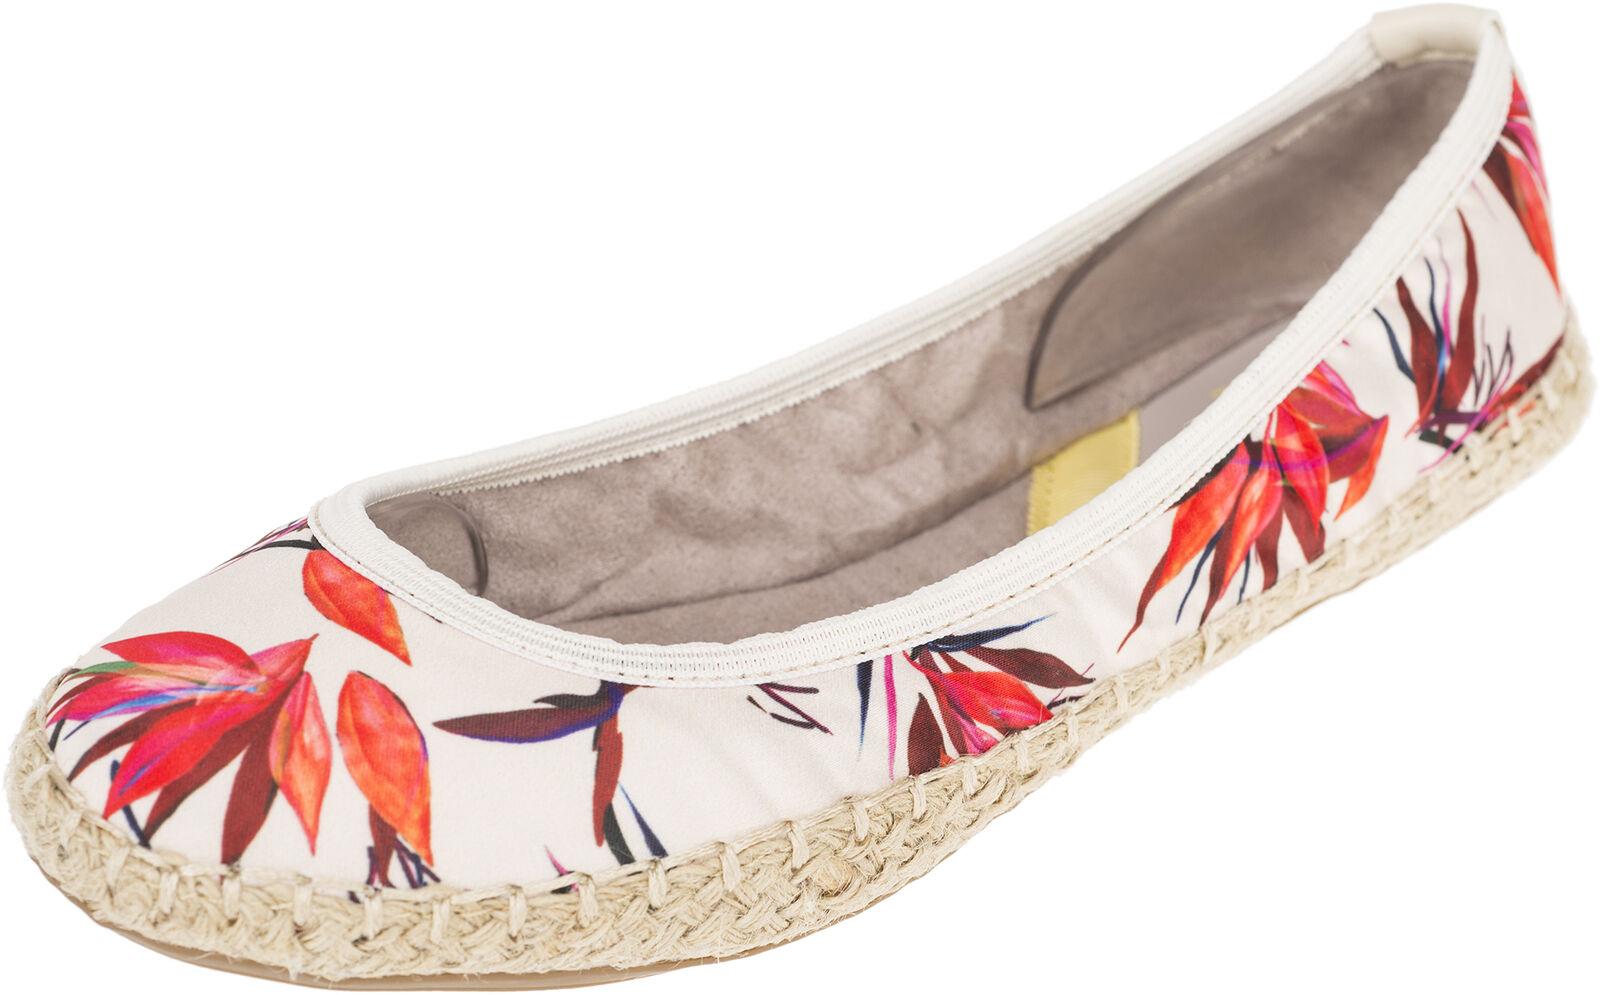 Butterfly Twists GIGI Birds Of Paradise Flats BALLERINAS - Creme Rockabilly